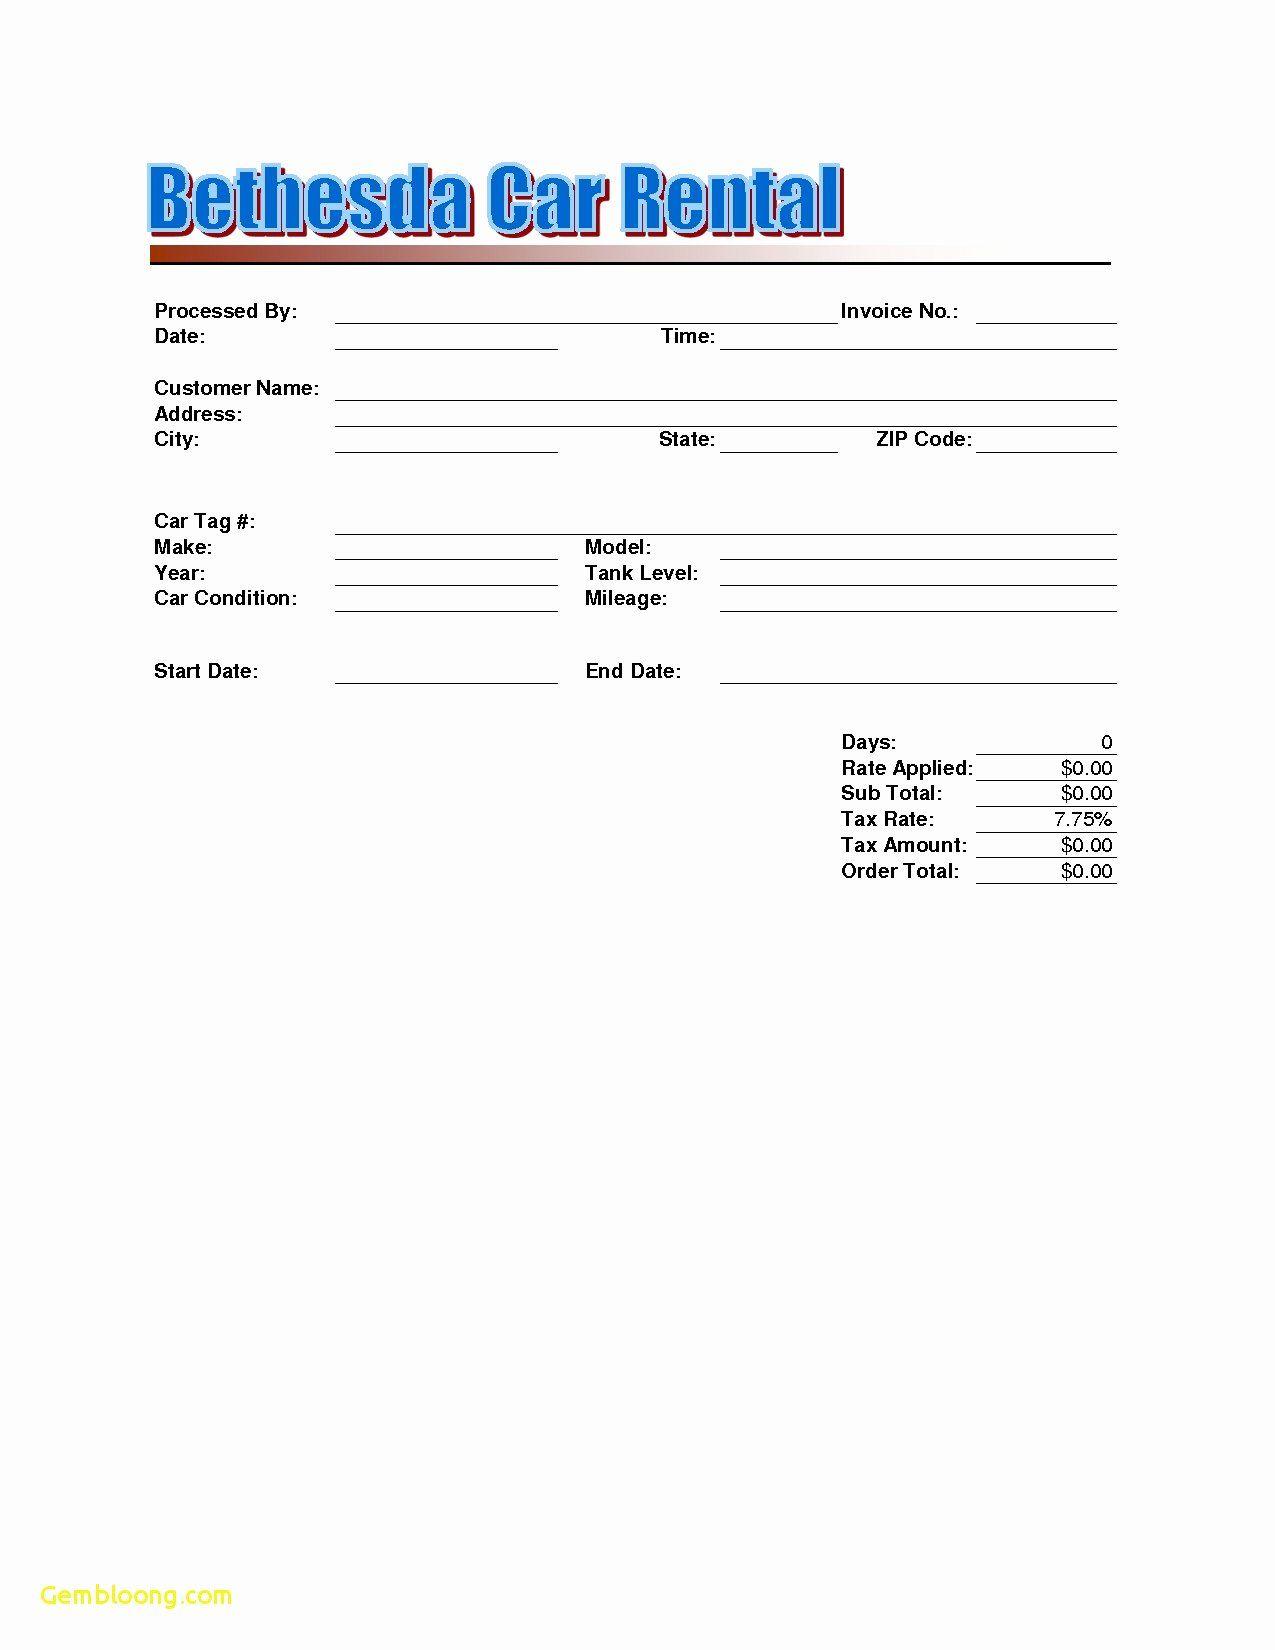 Car Rental Receipt Template Fresh 19 Car Rental Invoice Steamtraaleren Borgenes Invoice Template Word Invoice Template Receipt Template